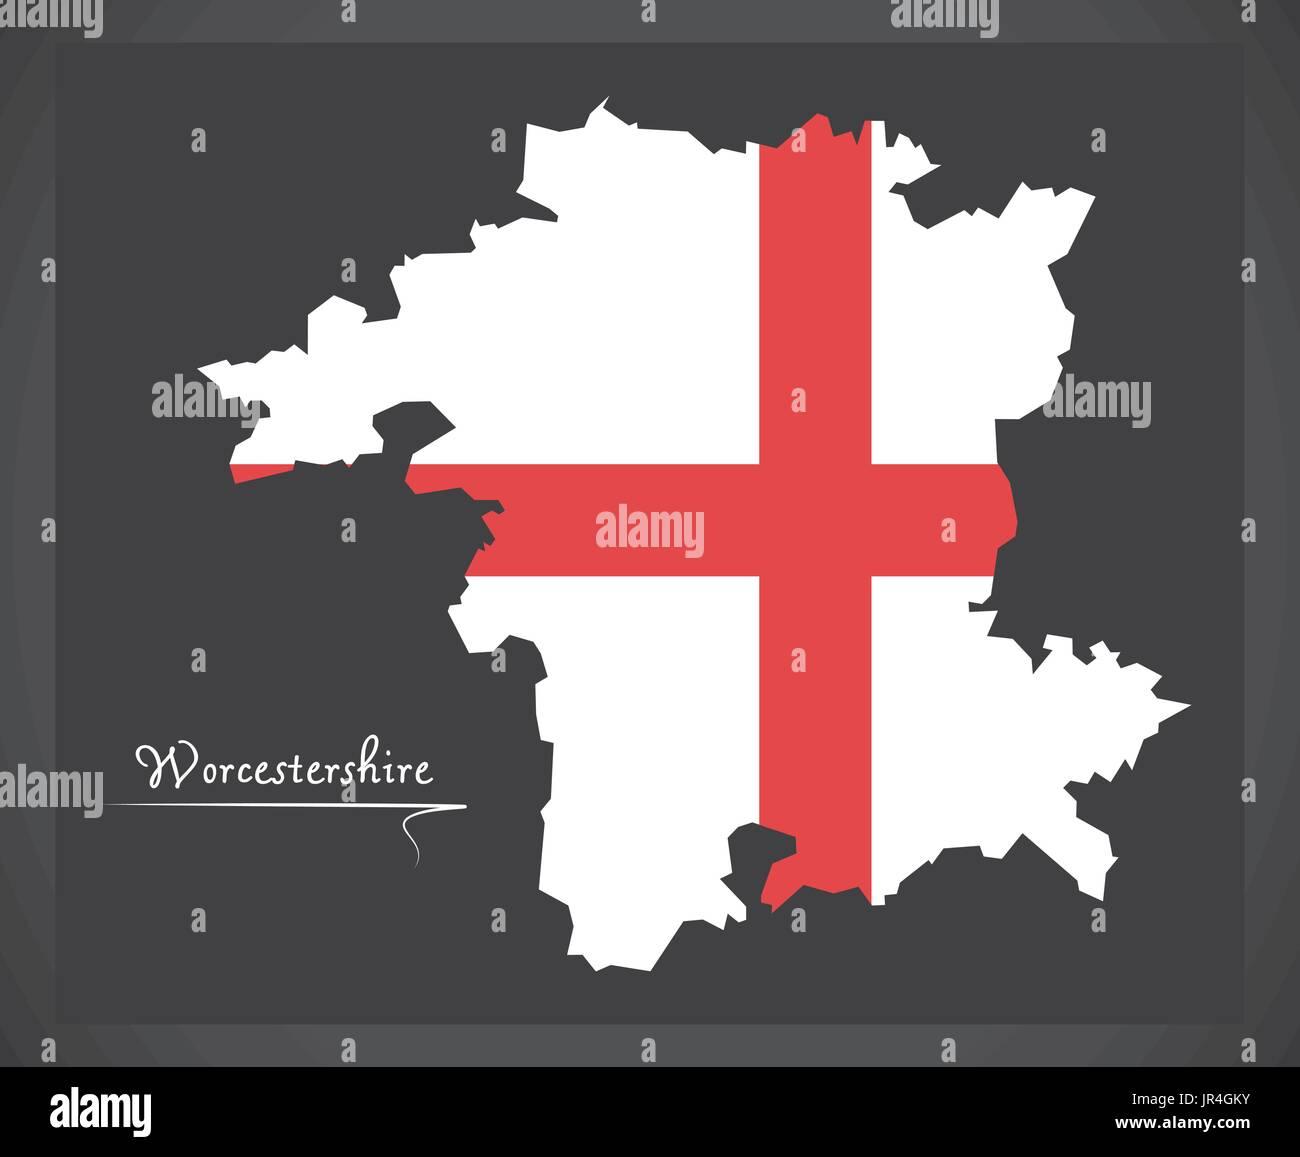 Worcestershire Map England Uk With English National Flag